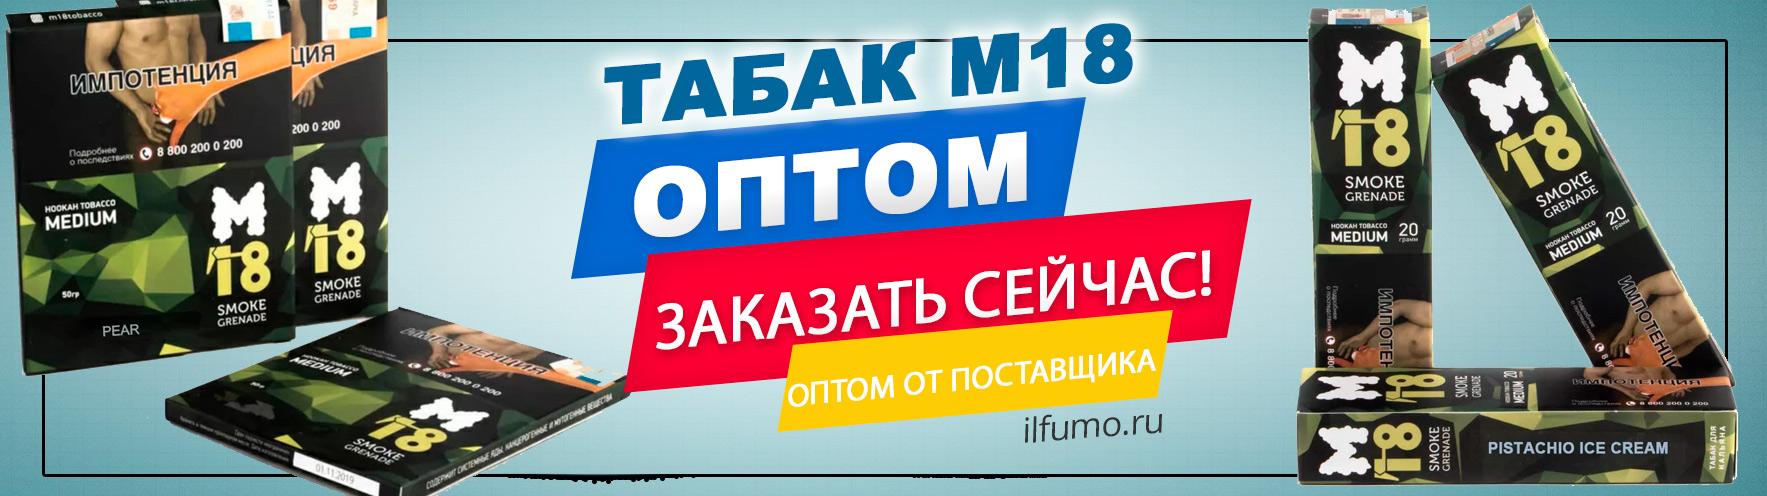 tabak dlja kaljana m18 optom v ilfumo - Табак для кальяна М18